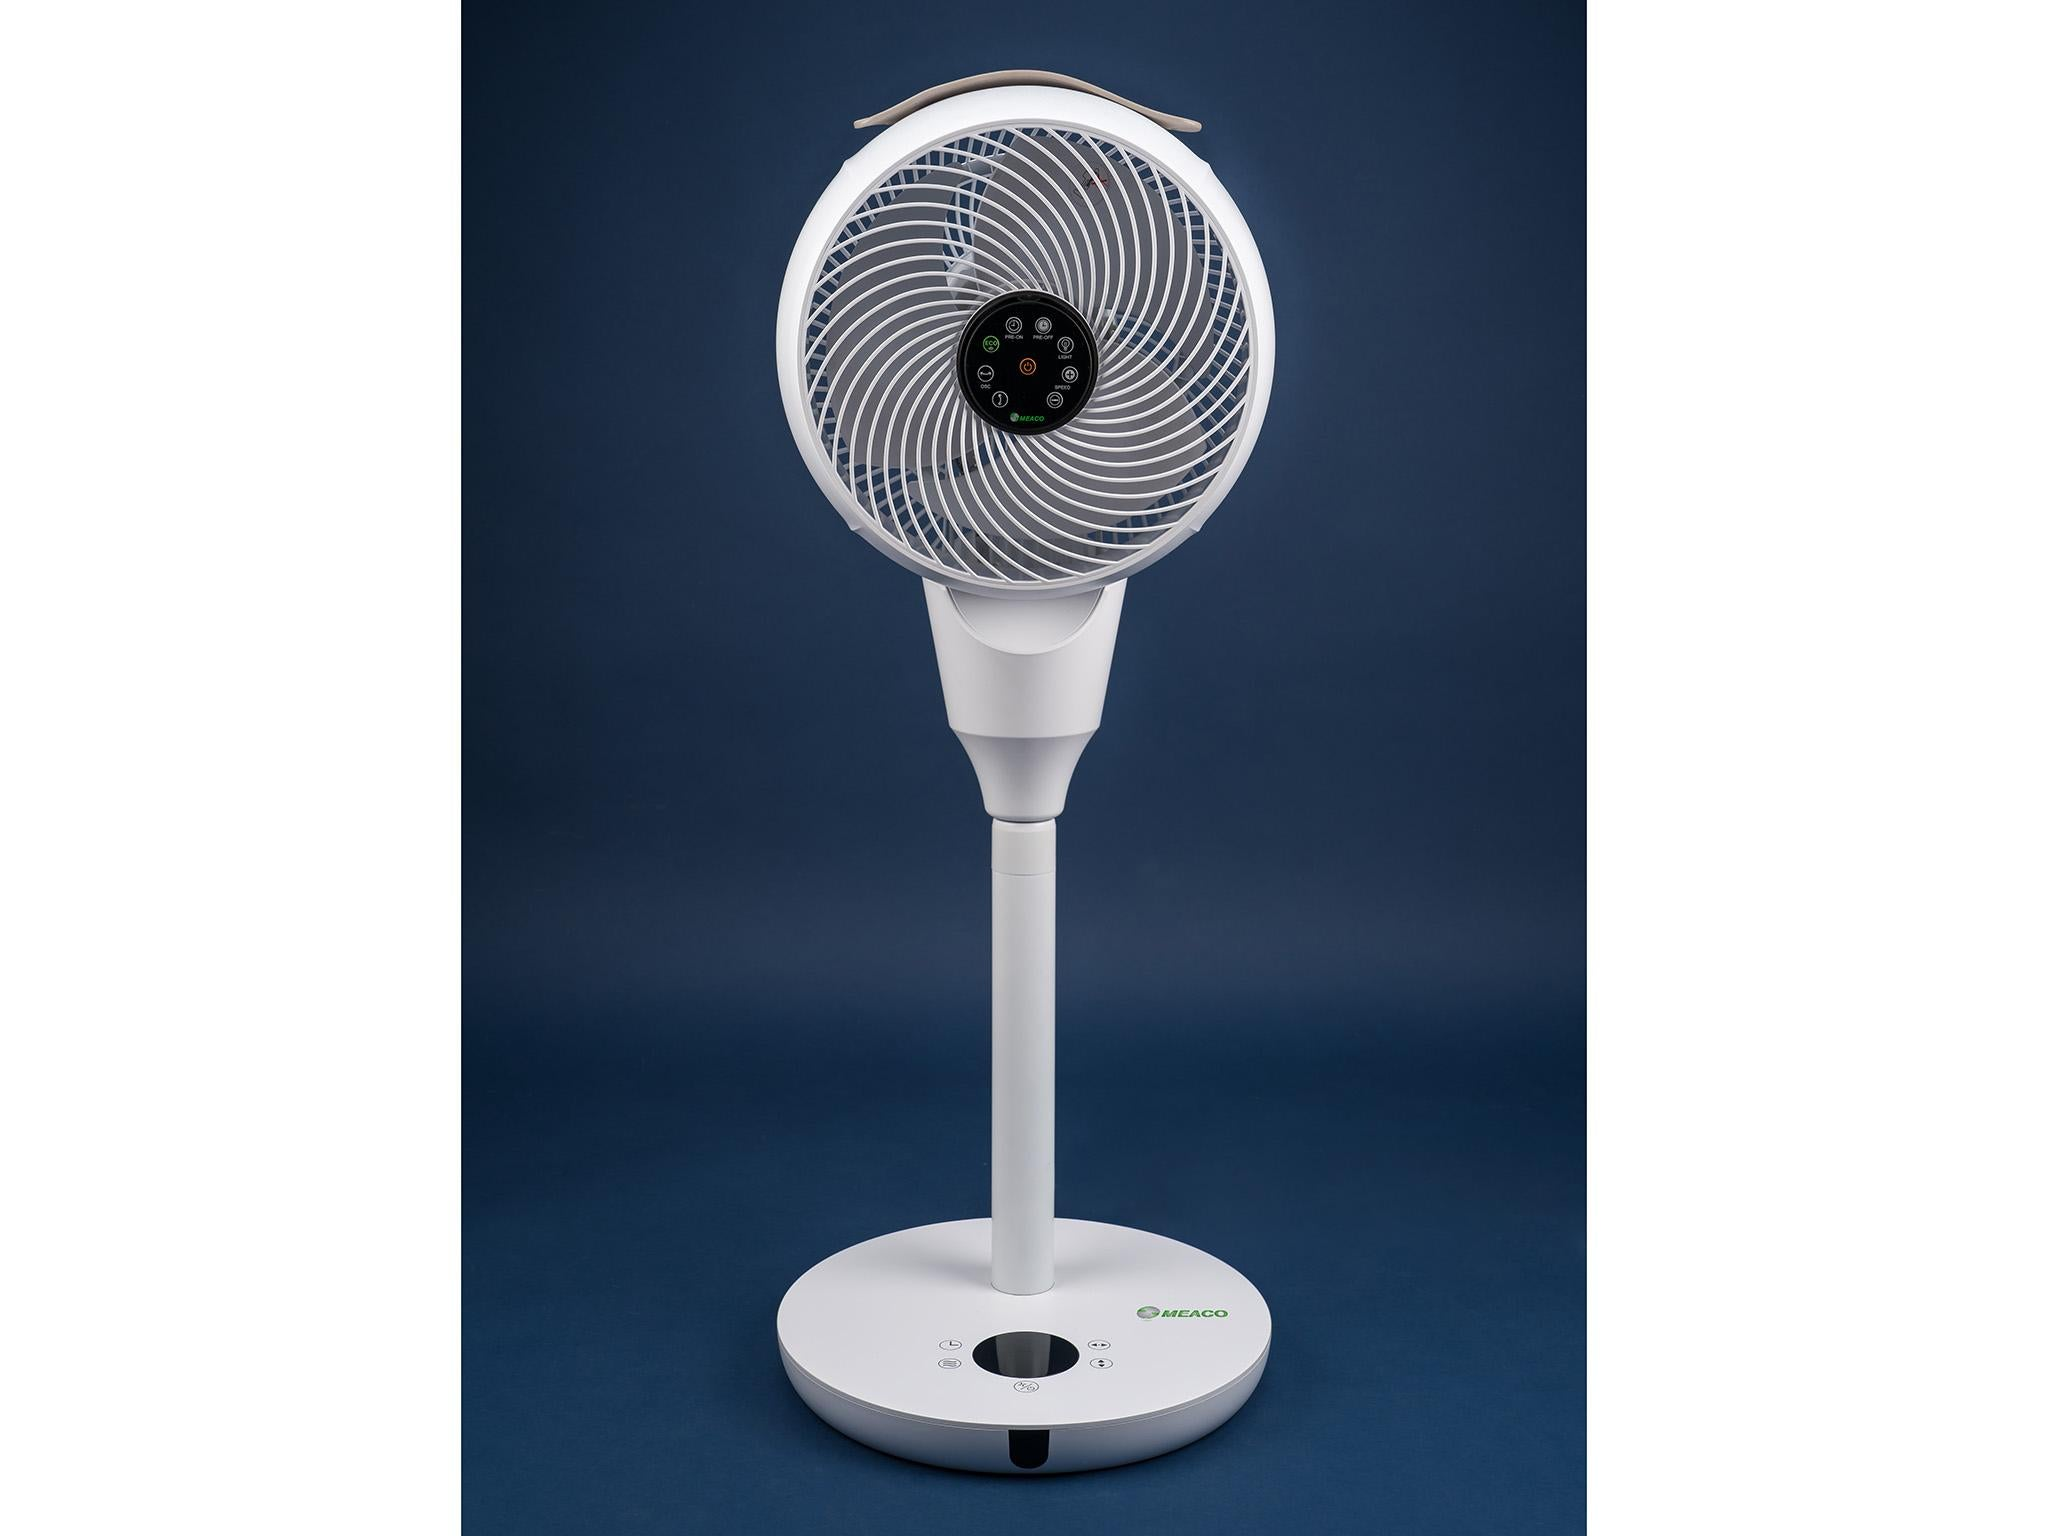 Color : Blue Air Cooler USB Multi-Function Small Fan 7 Blades Night Light Mini Handheld Desktop Car Electric Fan